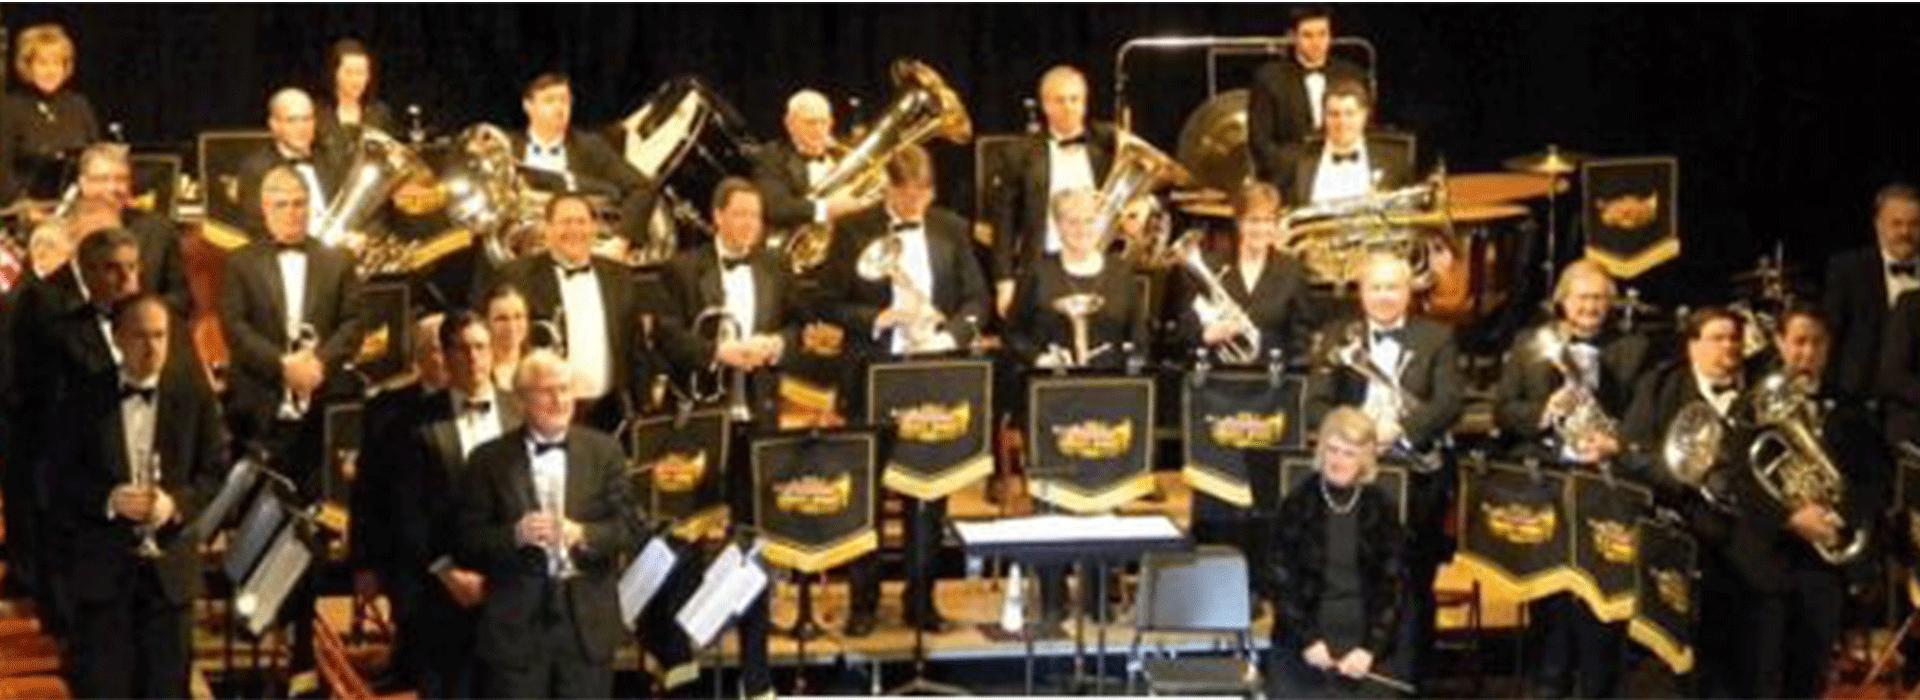 The Cincinnati Brass Band Concert